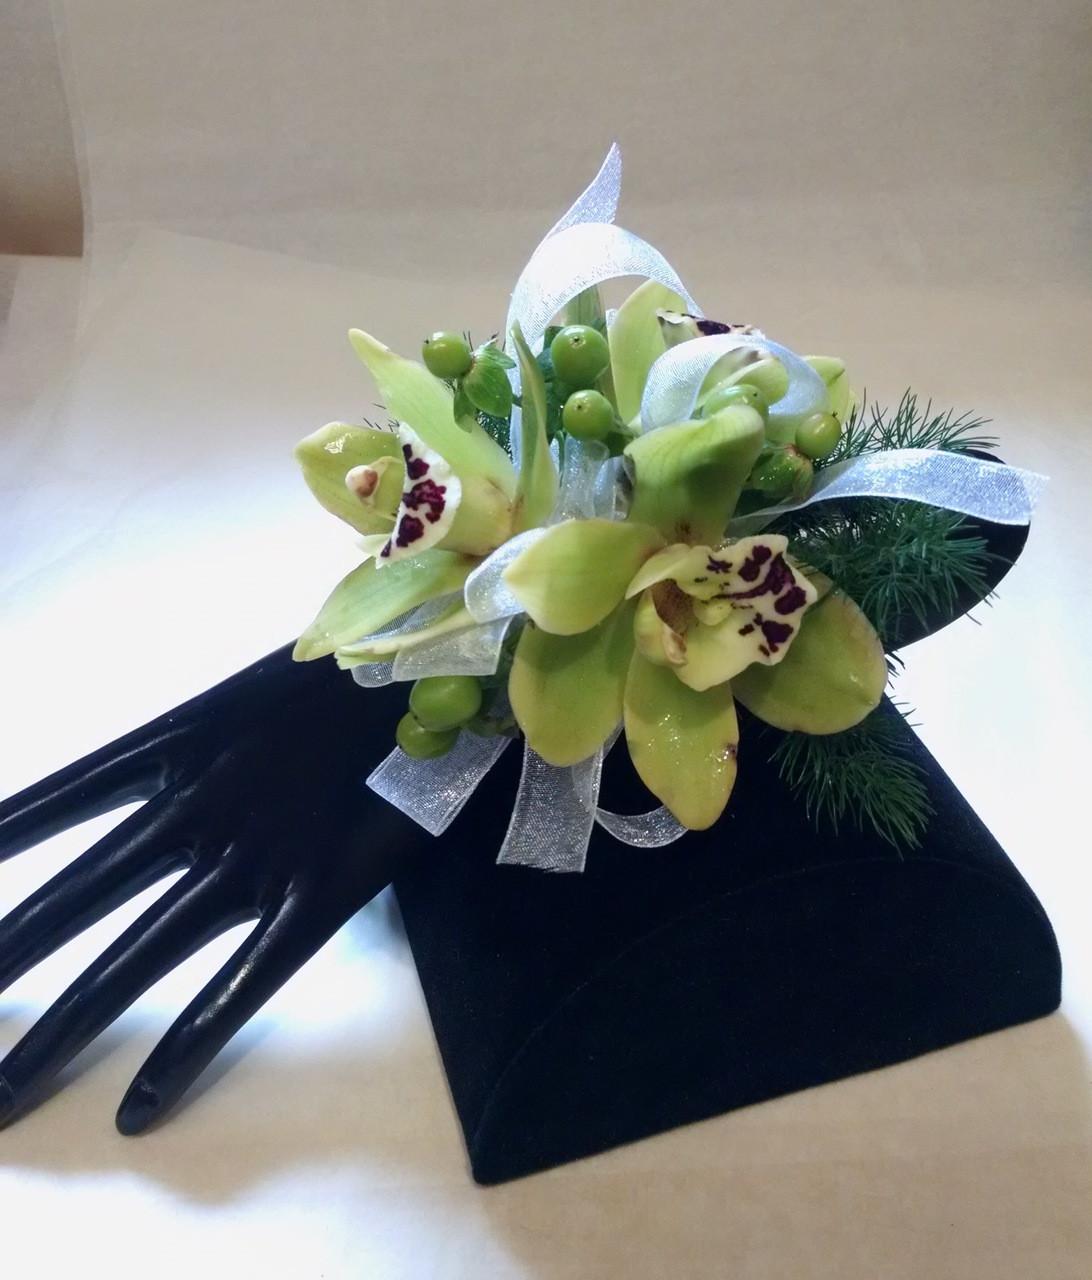 Cymbidium Orchid Wrist Corsages: Cymbidium Orchid Wrist Corsage -Pick Up Only